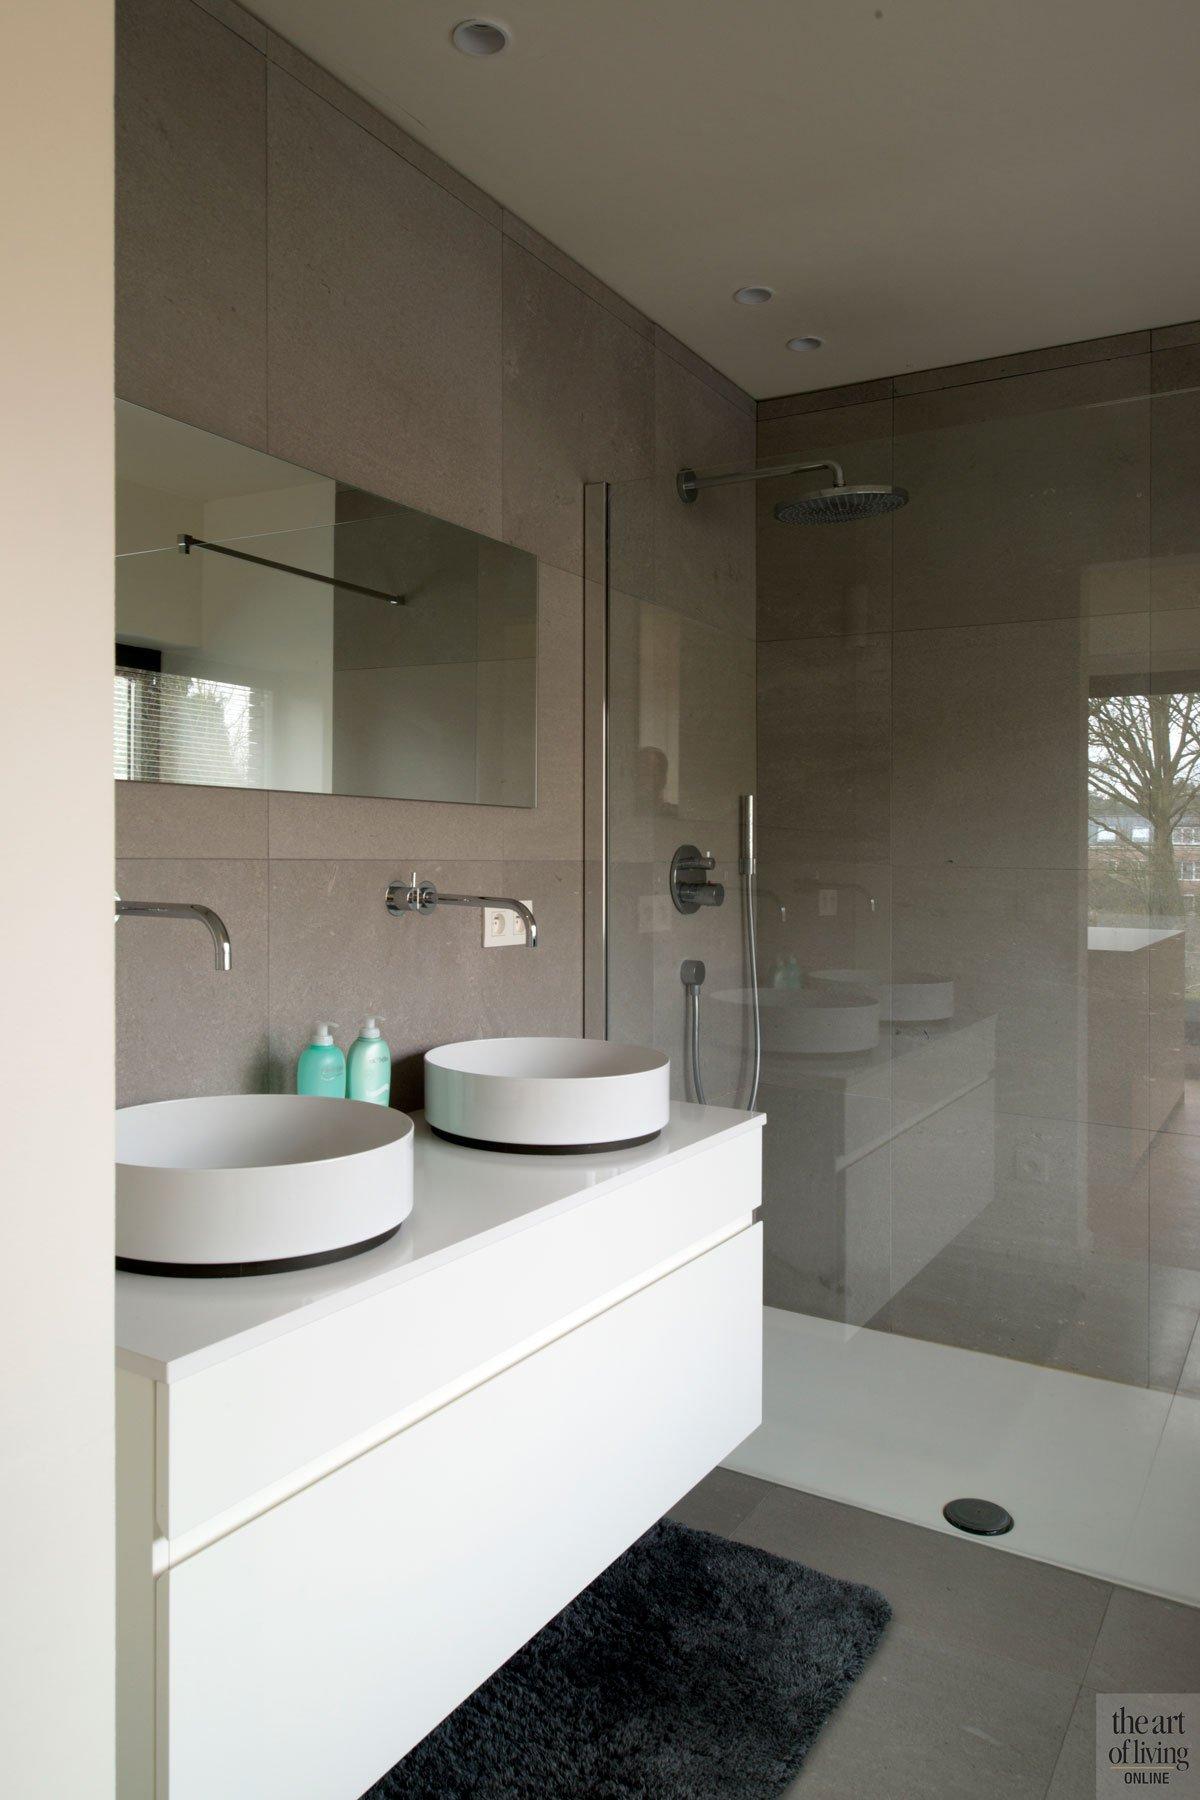 Badkamer, waskommen, Alape, douche, sanitair, inloopdouche, moderne villa, Leers & Partners